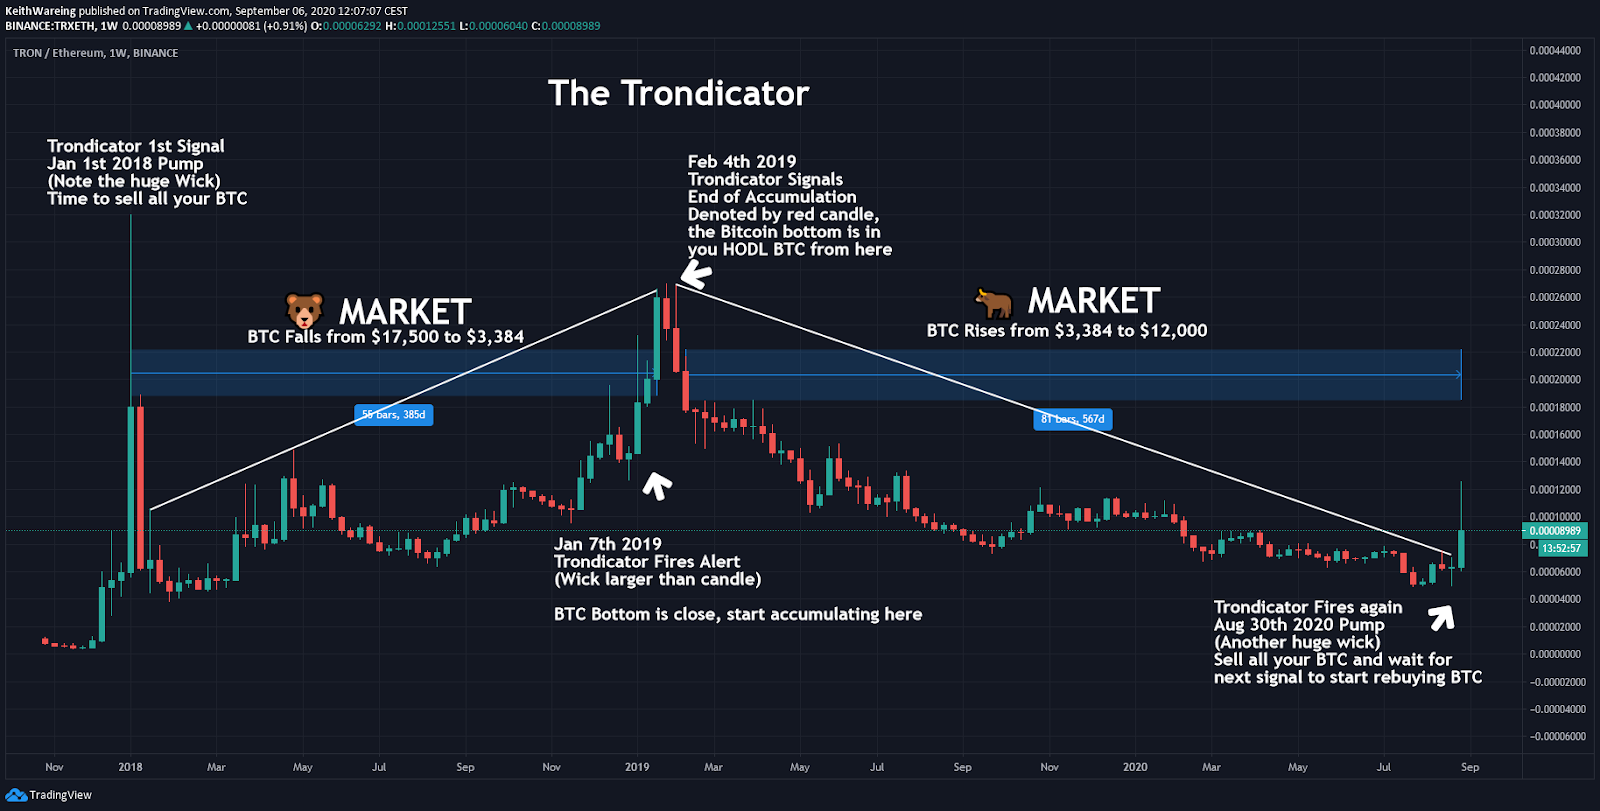 TRX/ETH 1-week chart. Source: TradingView